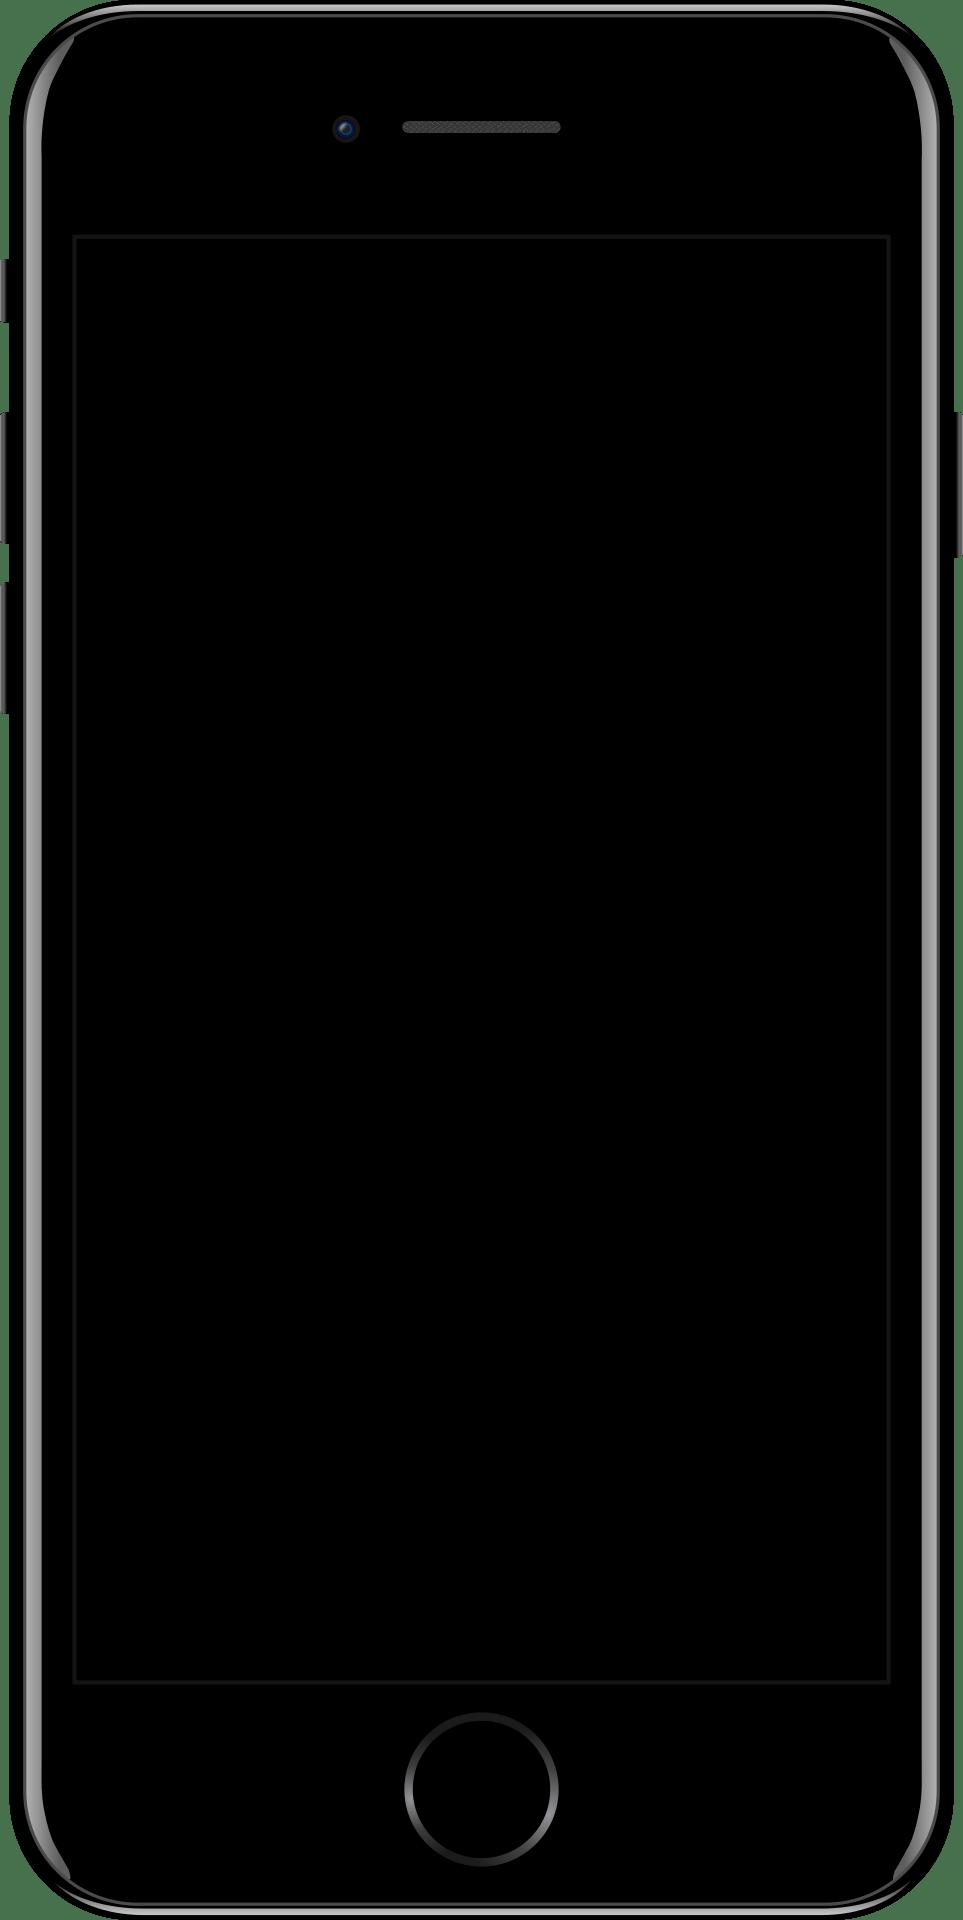 Jet Black Iphone 7